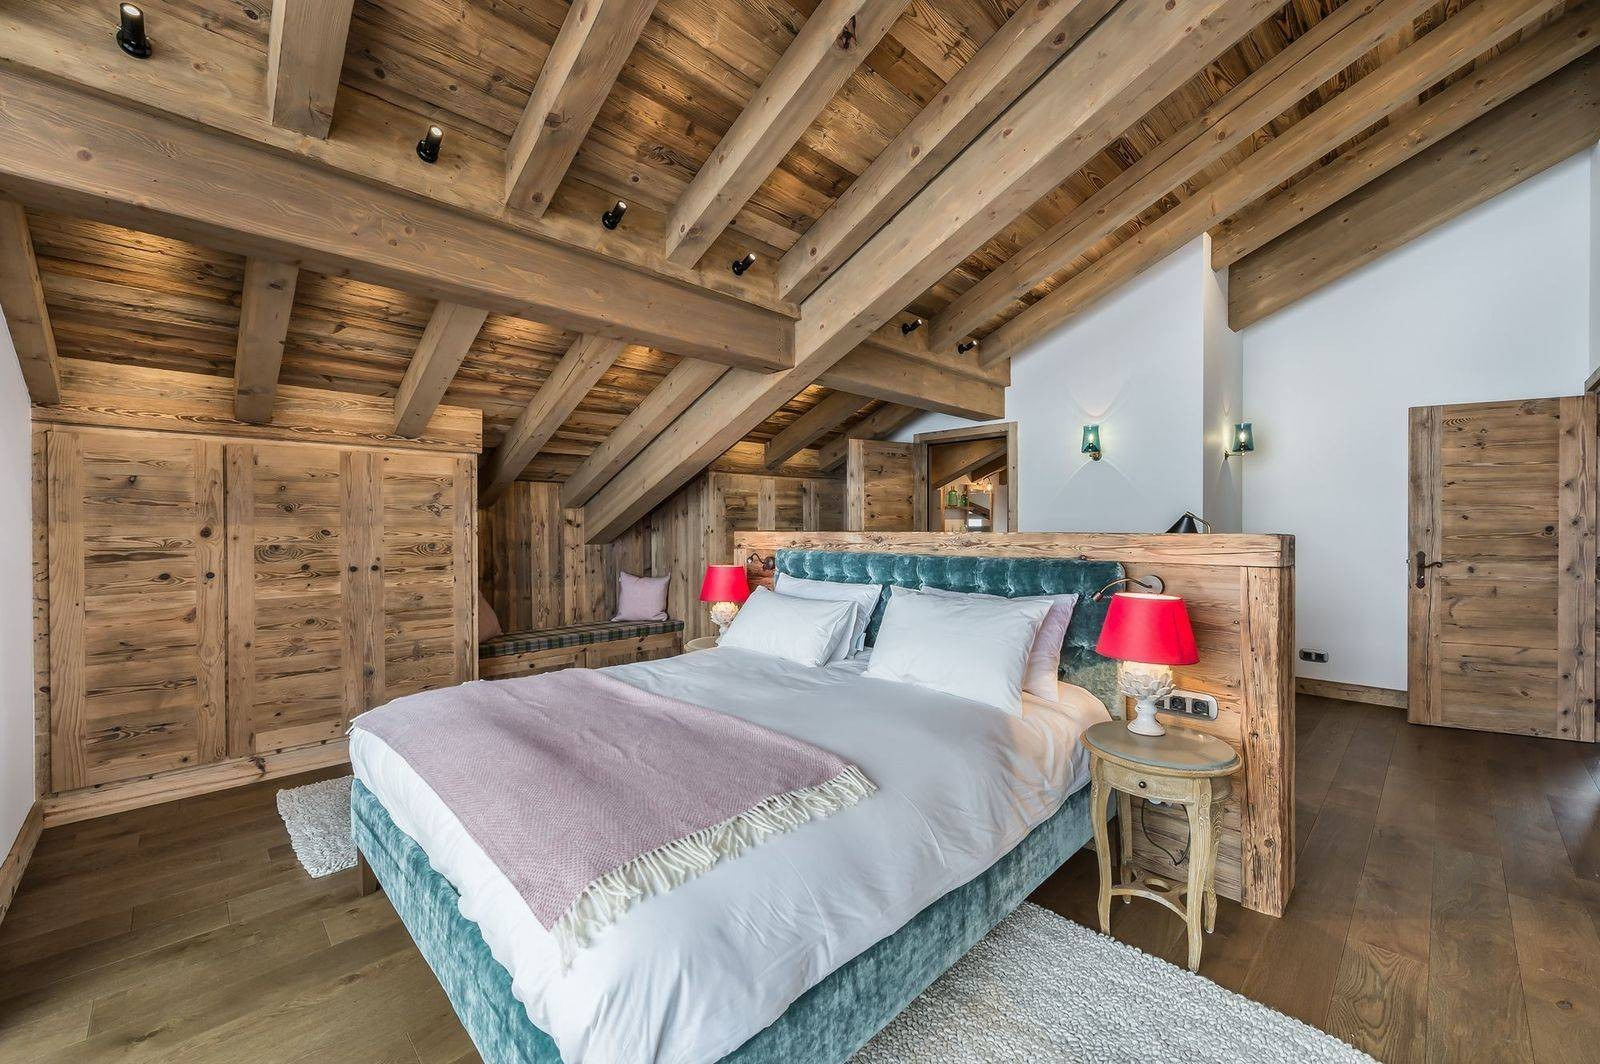 Courchevel 1650 Location Chalet Luxe Ebella Chambre 5